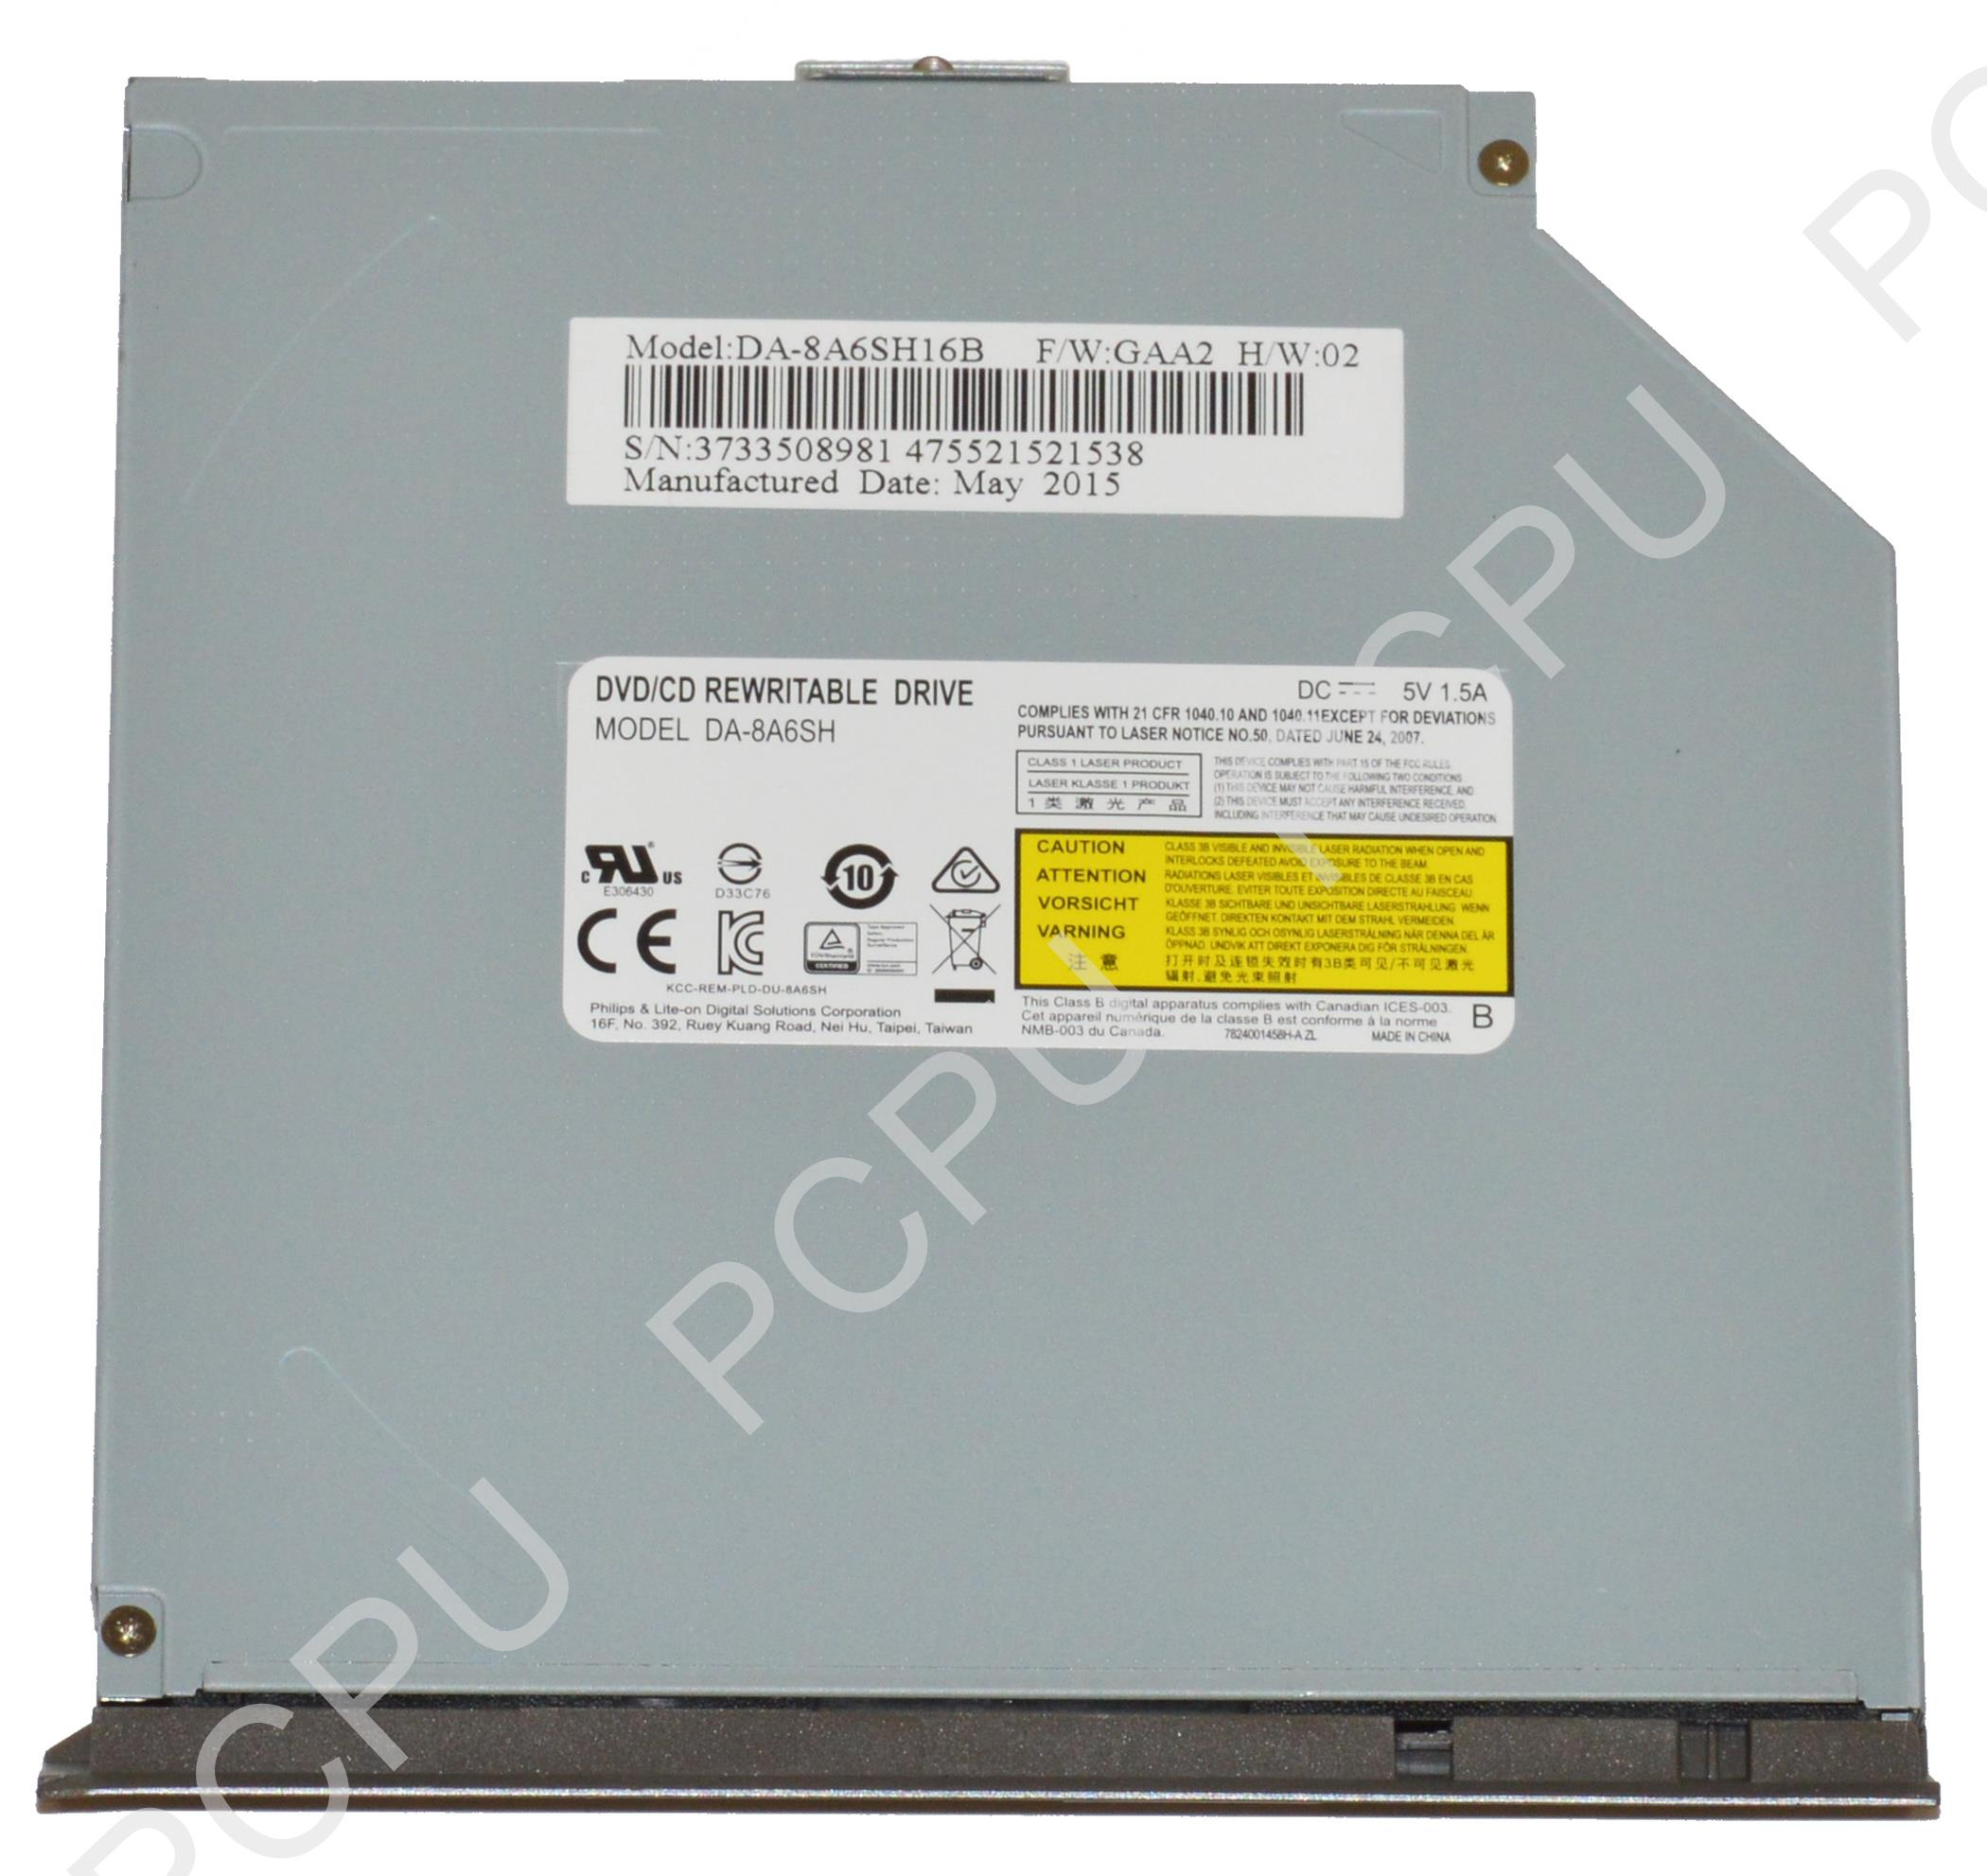 17604-00012300 Asus ROG G752VW DVD+//-RW SuperMulti Drive